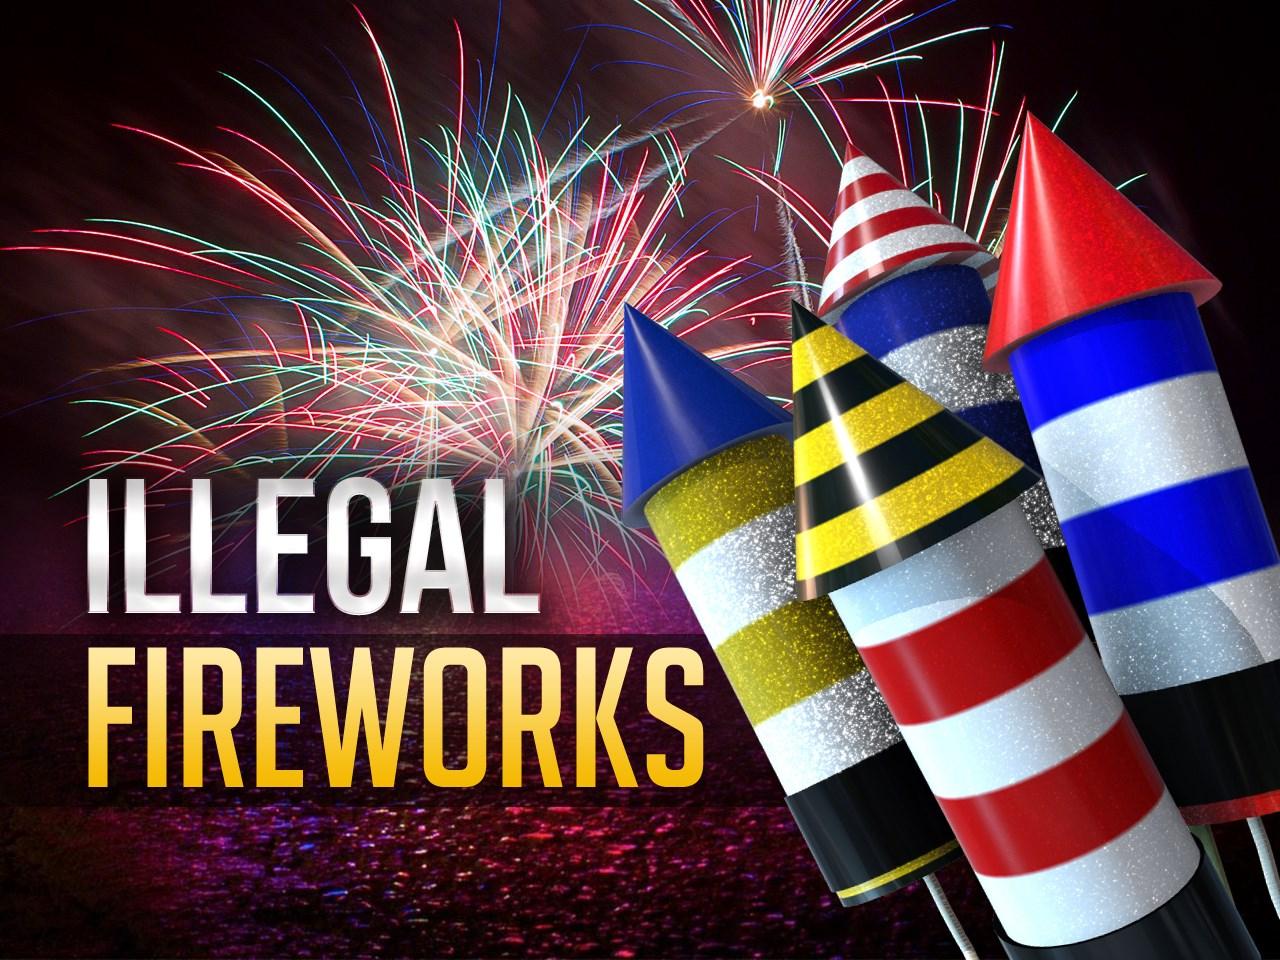 IllegalFireworks_1528396245938.jpg